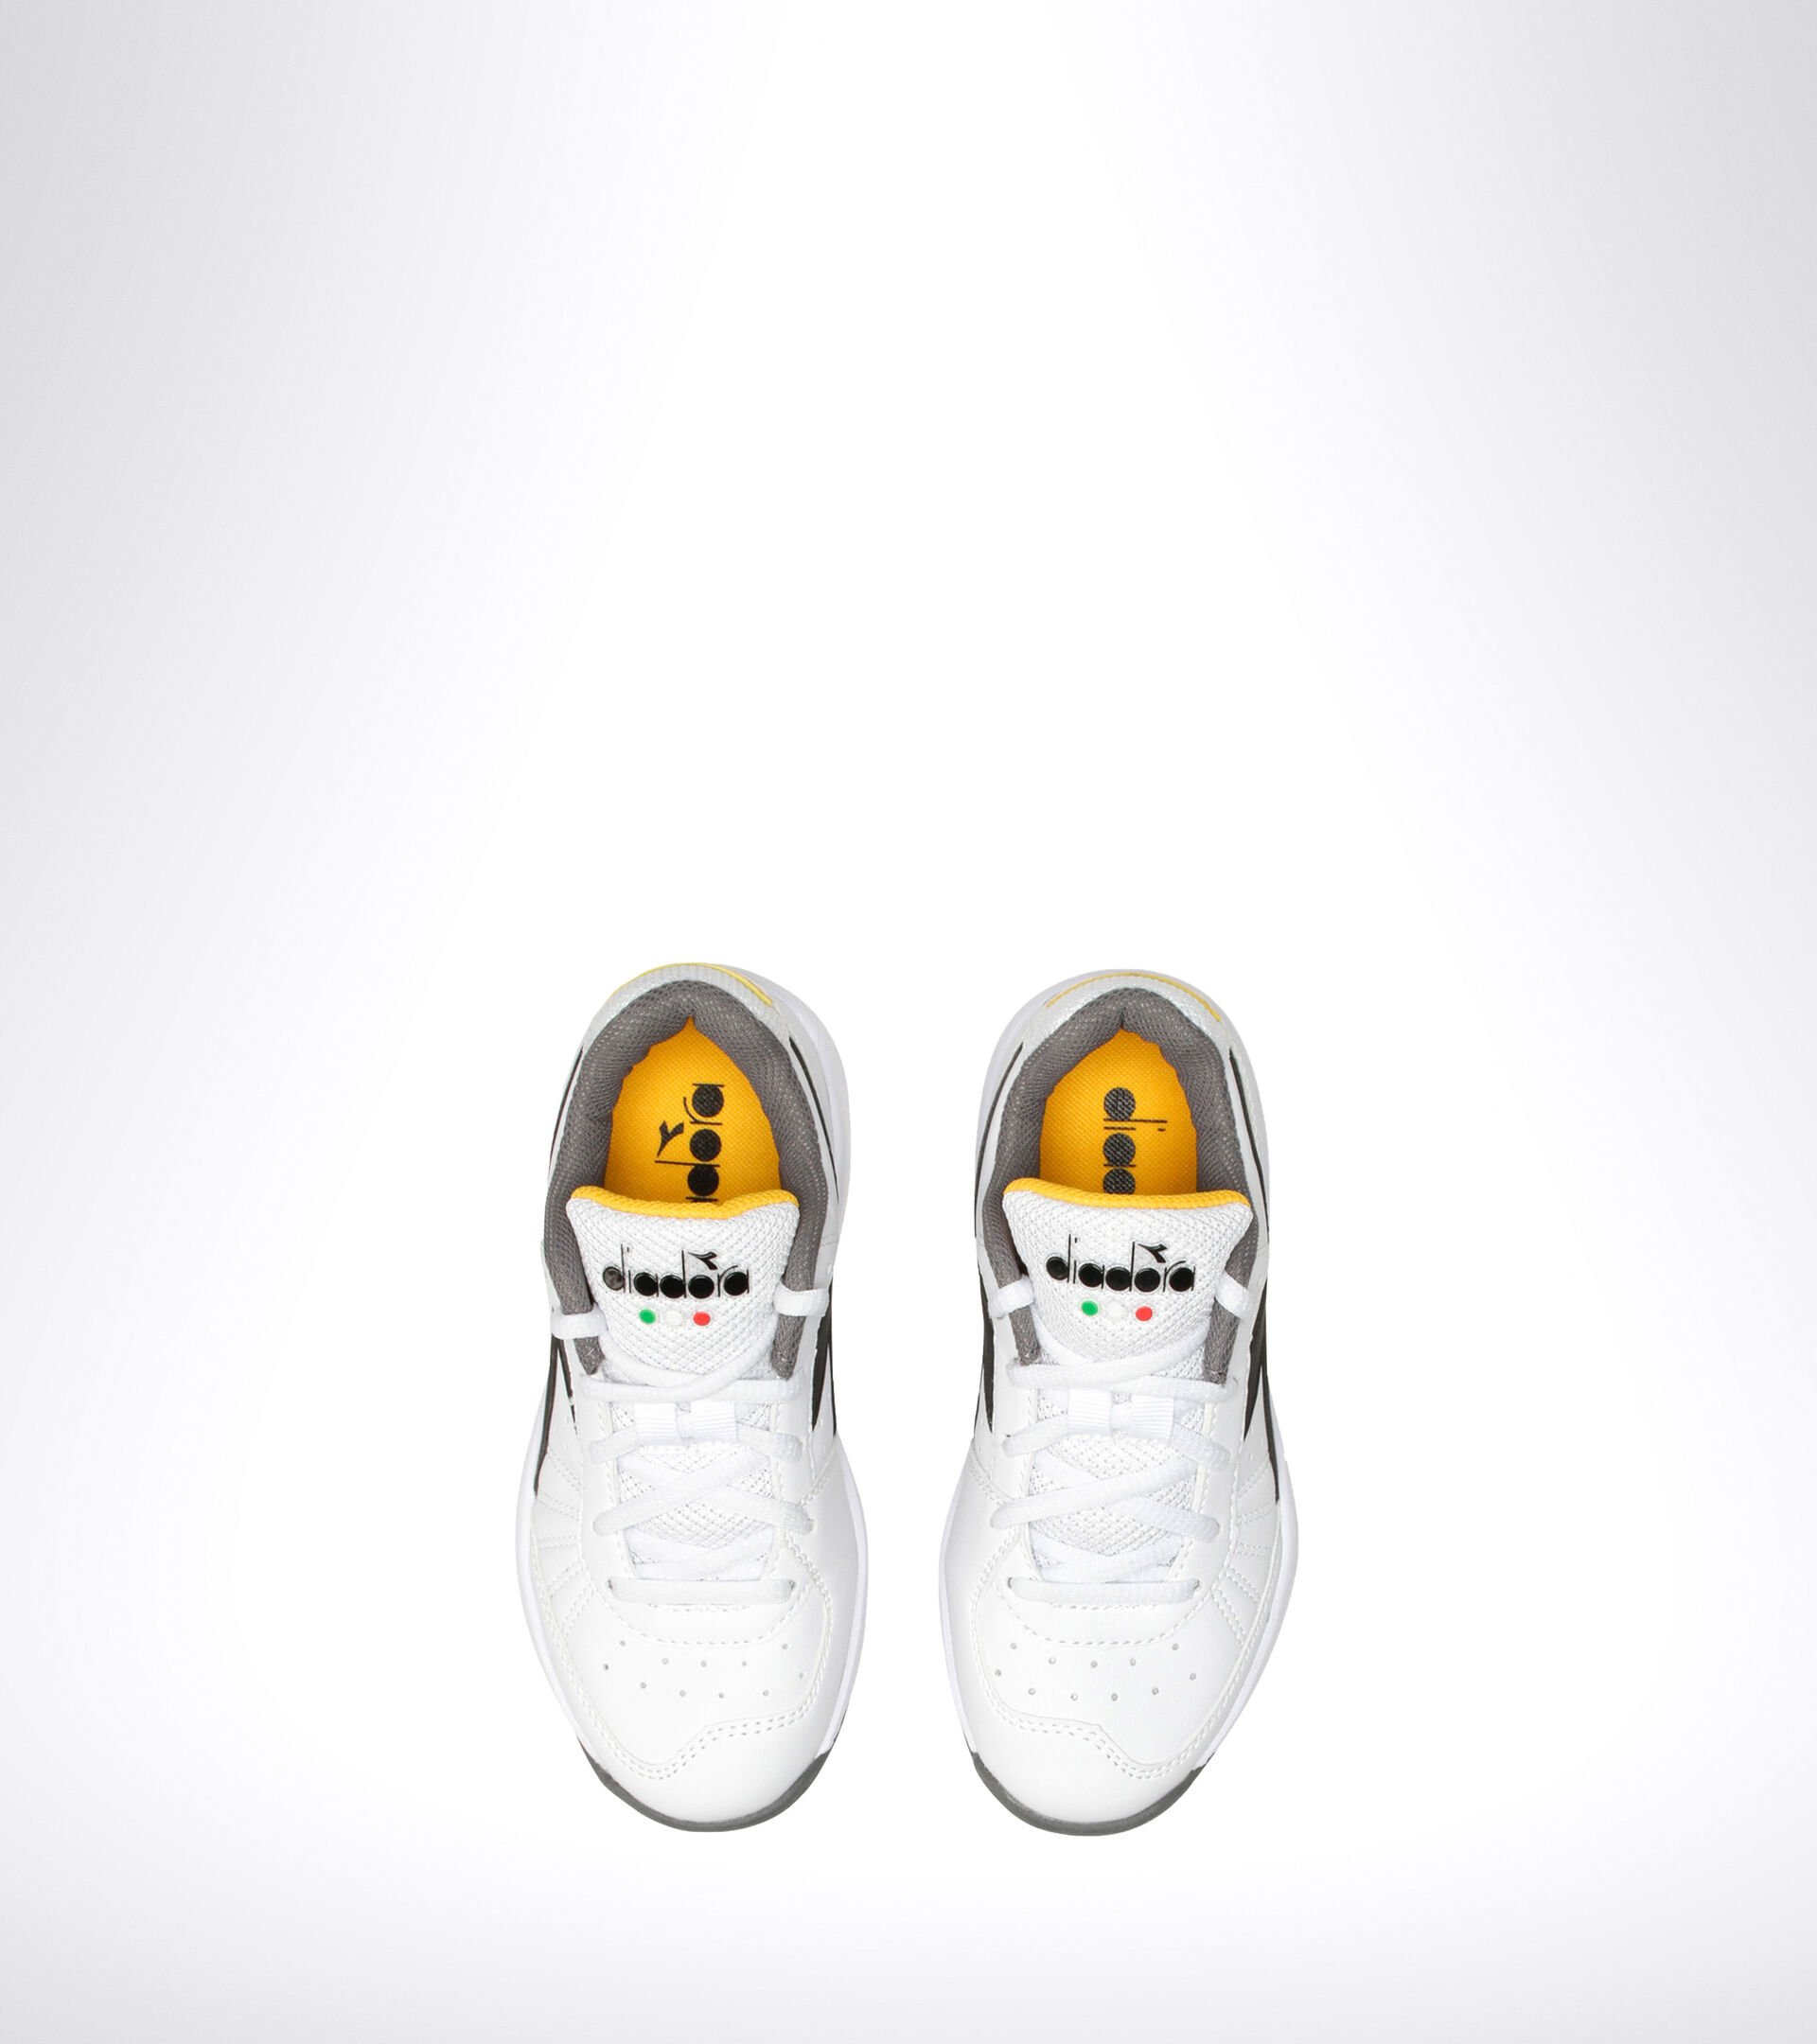 Clay and hard court tennis shoe - Kids S. CHALLENGE 3 SL JR WHITE/BLACK/SAFFRON - Diadora